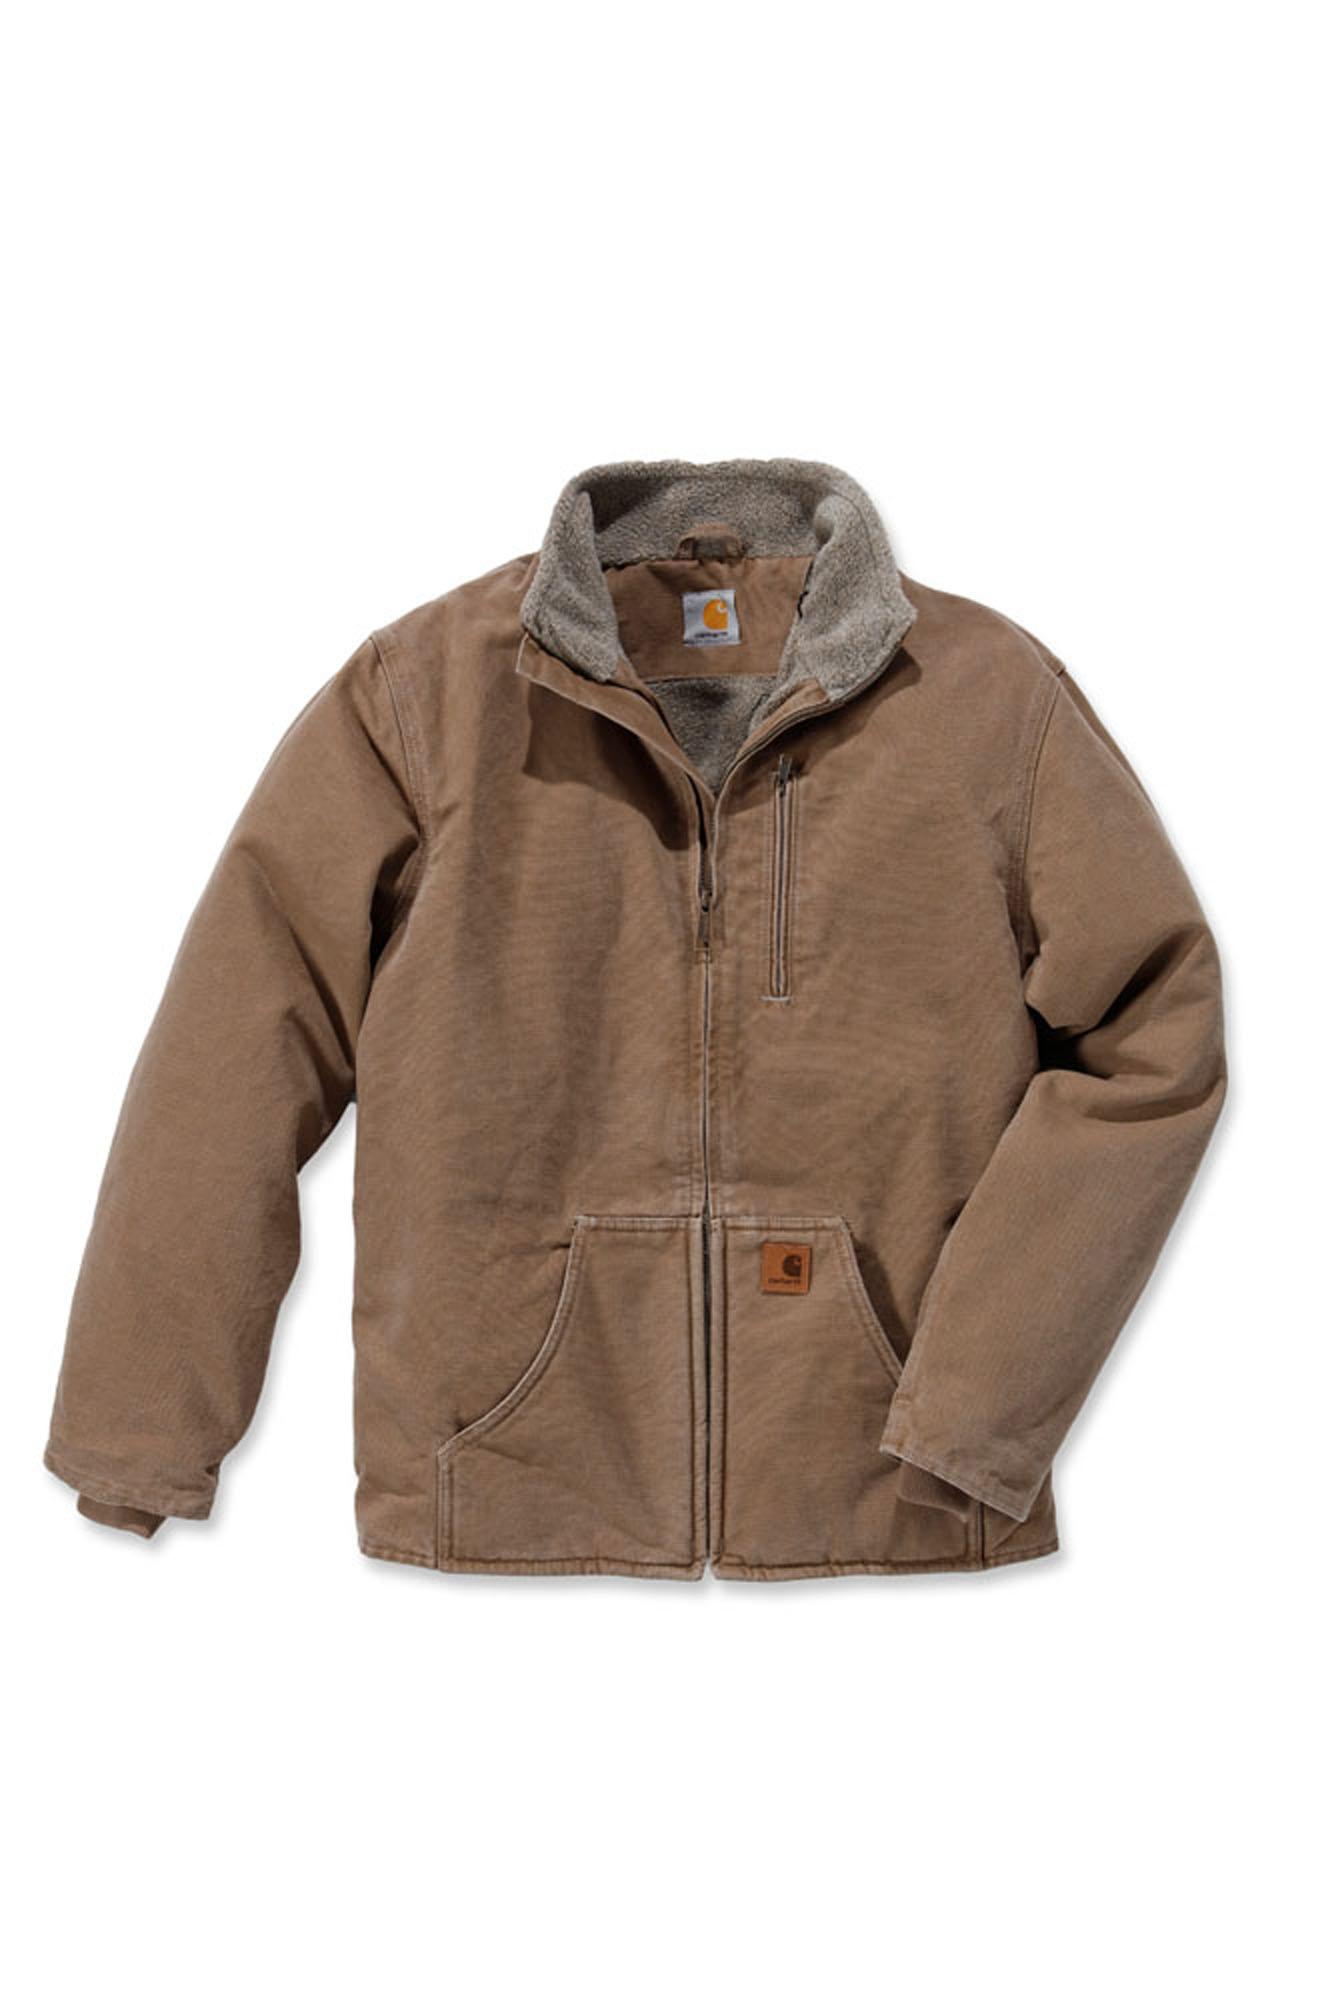 carhartt 100112 muskegon jacket mens new workwear work coat ebay. Black Bedroom Furniture Sets. Home Design Ideas